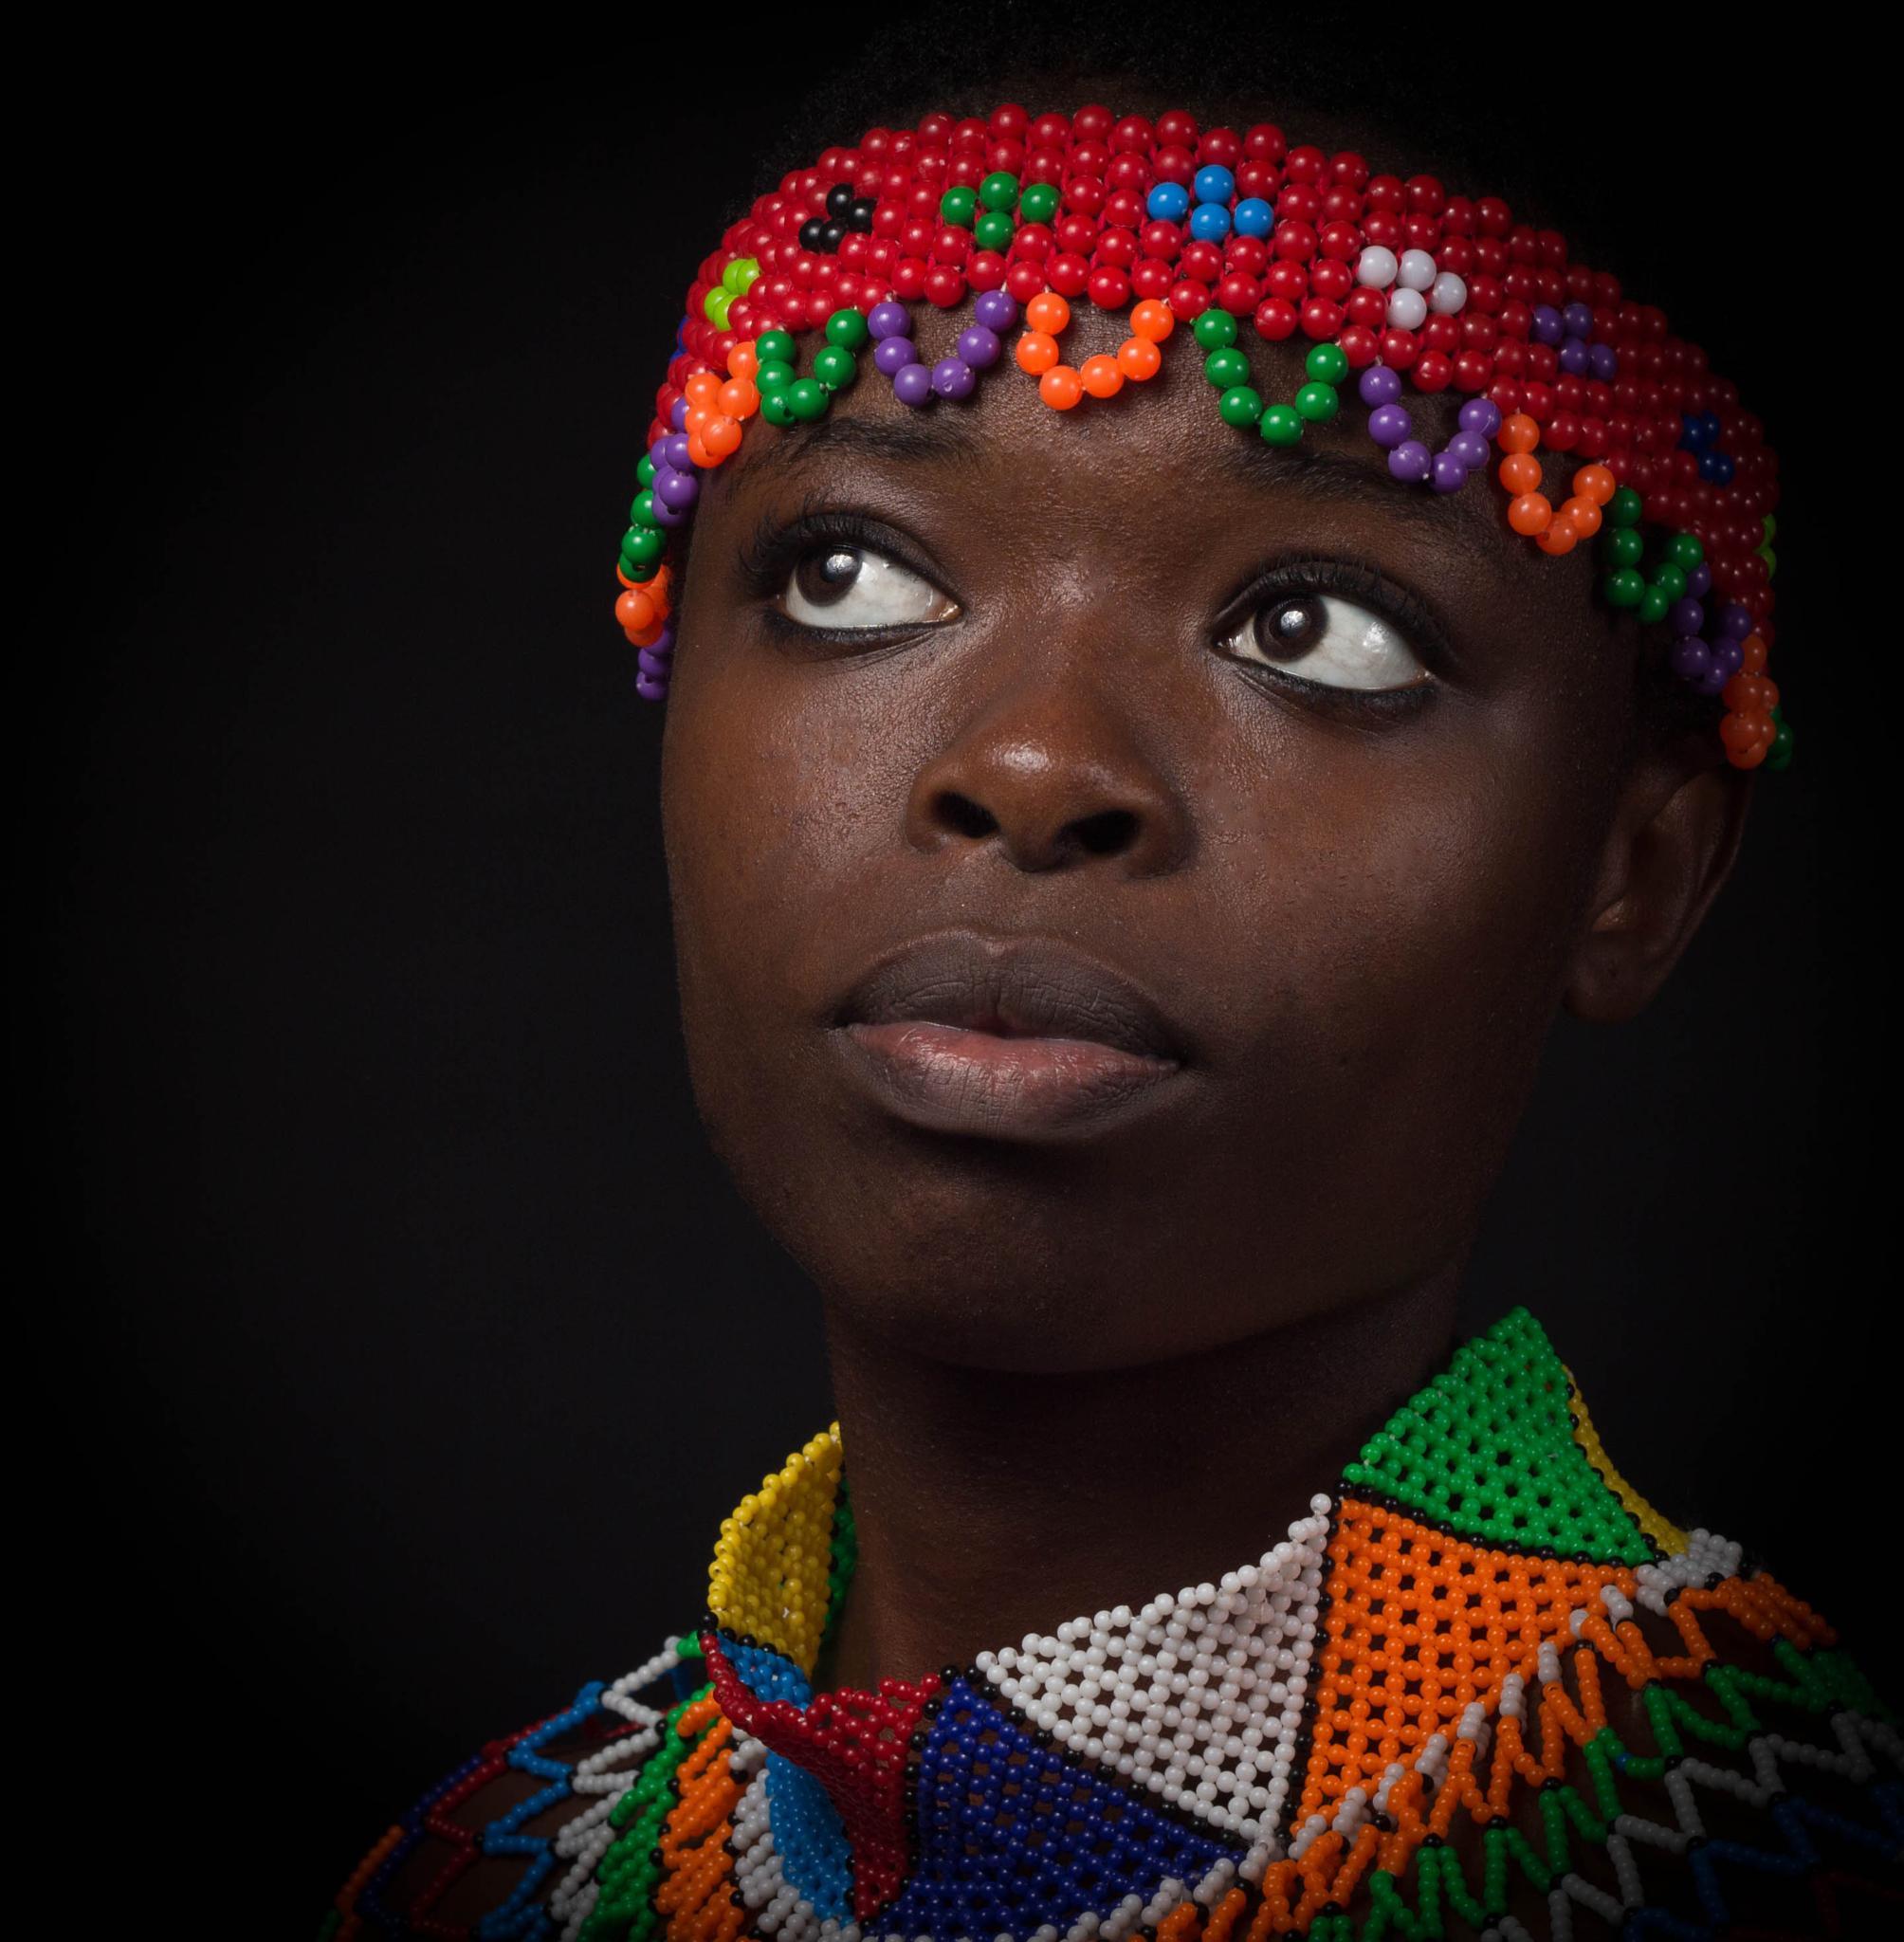 Traditional Zulu girl from South Africa by Johan Syffert